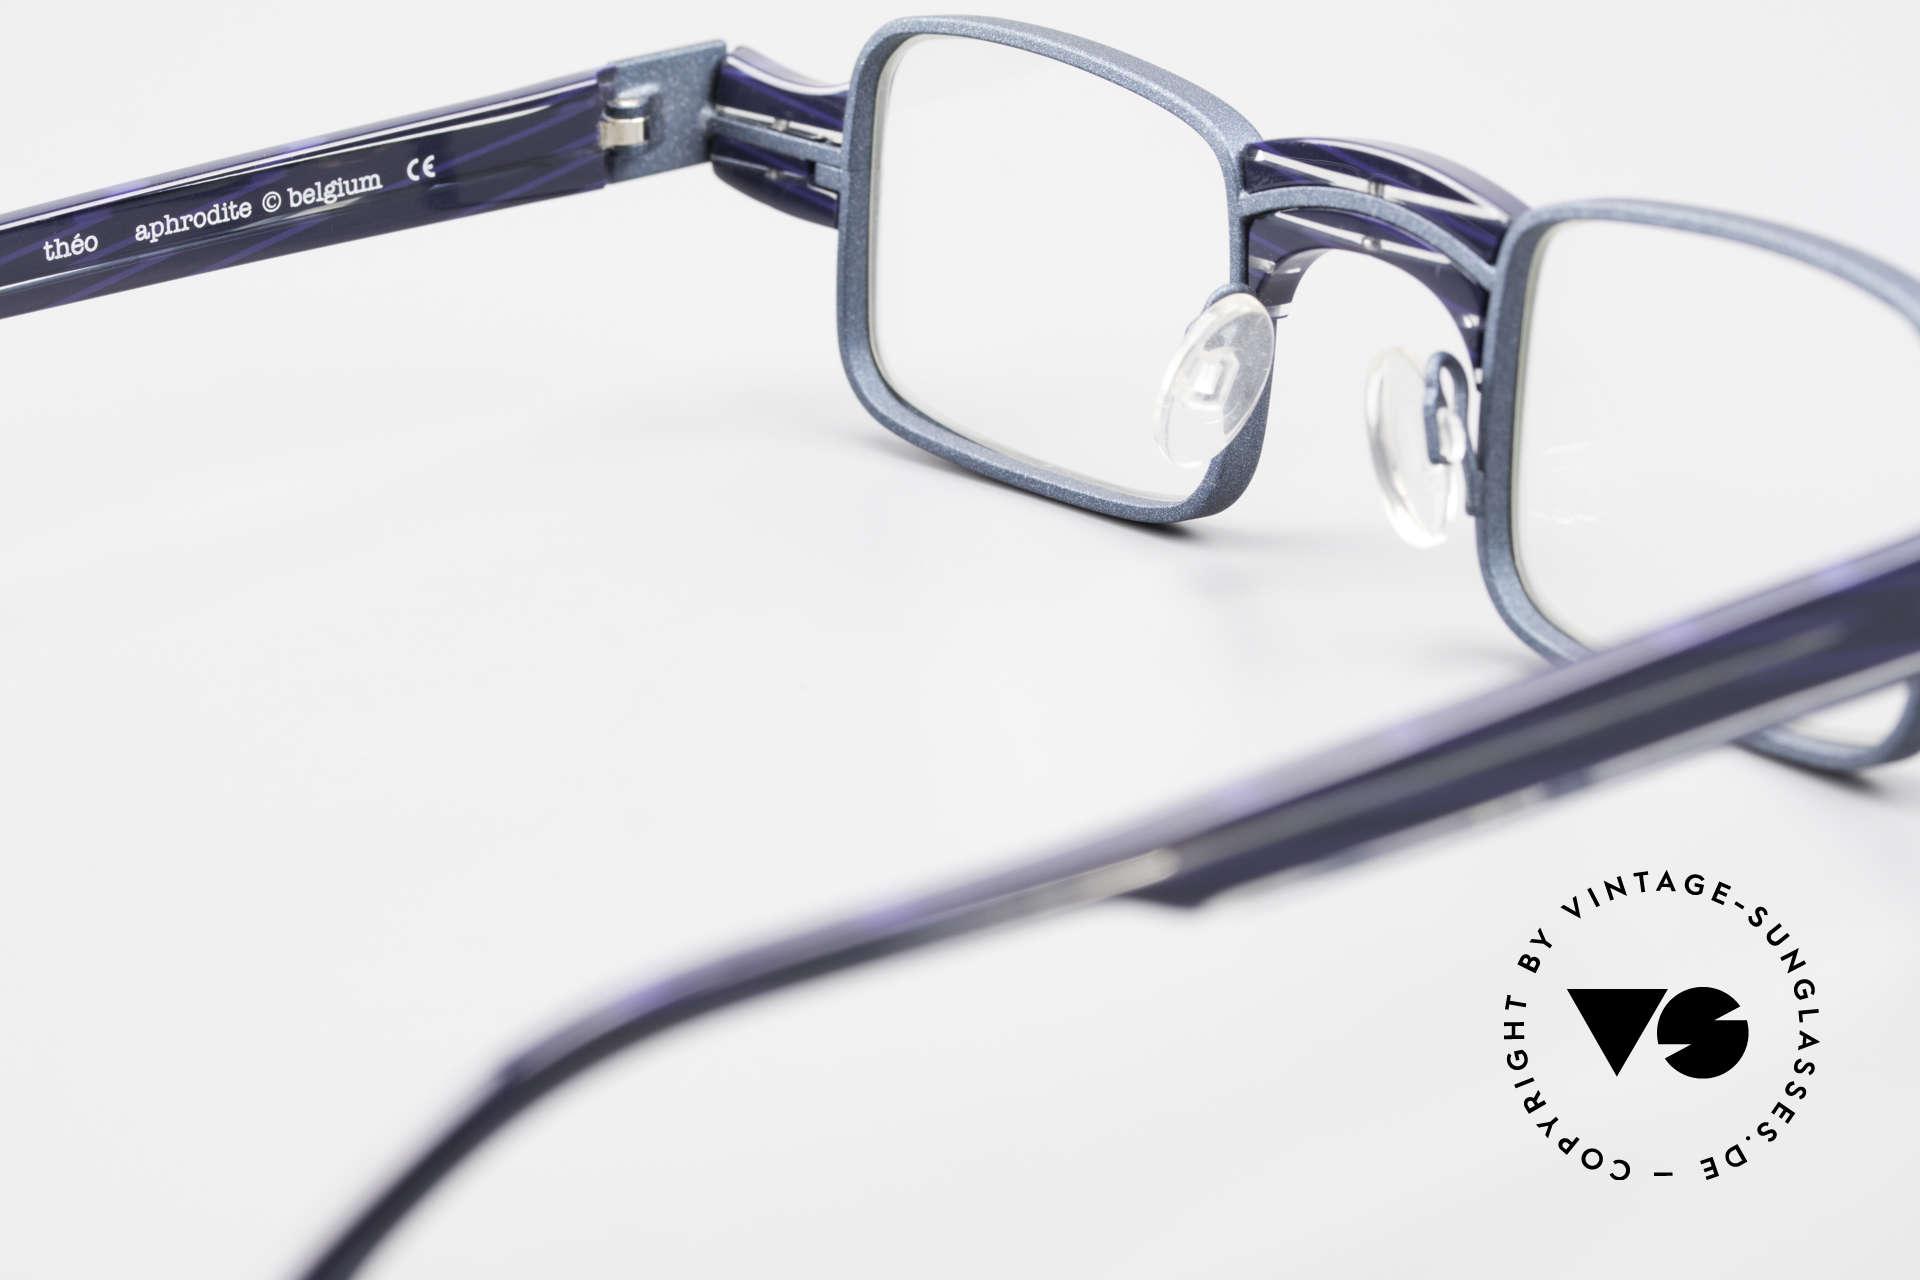 Theo Belgium Aphrodite Vintage Combi Designer Specs, unworn vintage eyeglass-frame (with representativeness), Made for Women